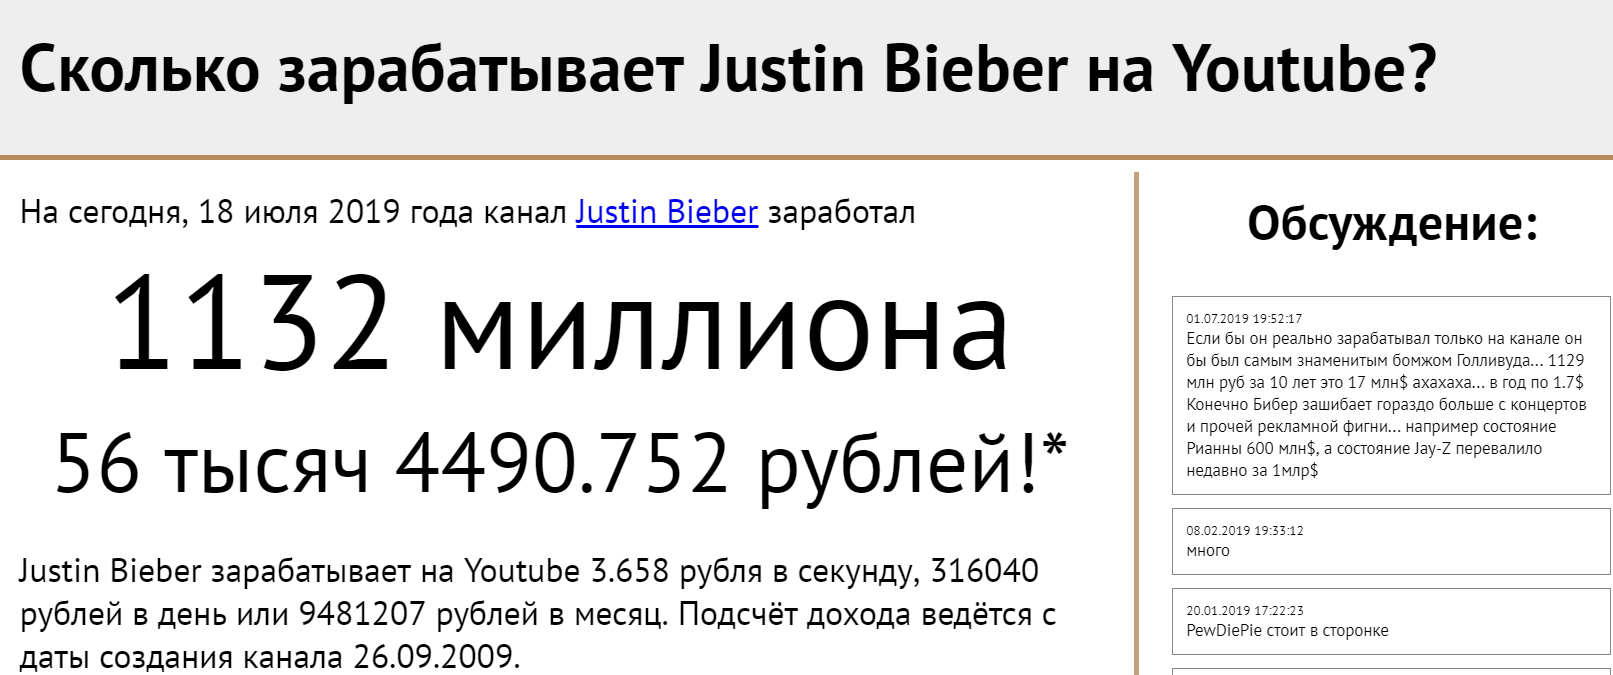 Сколько зарабатывает Джастин Бибер